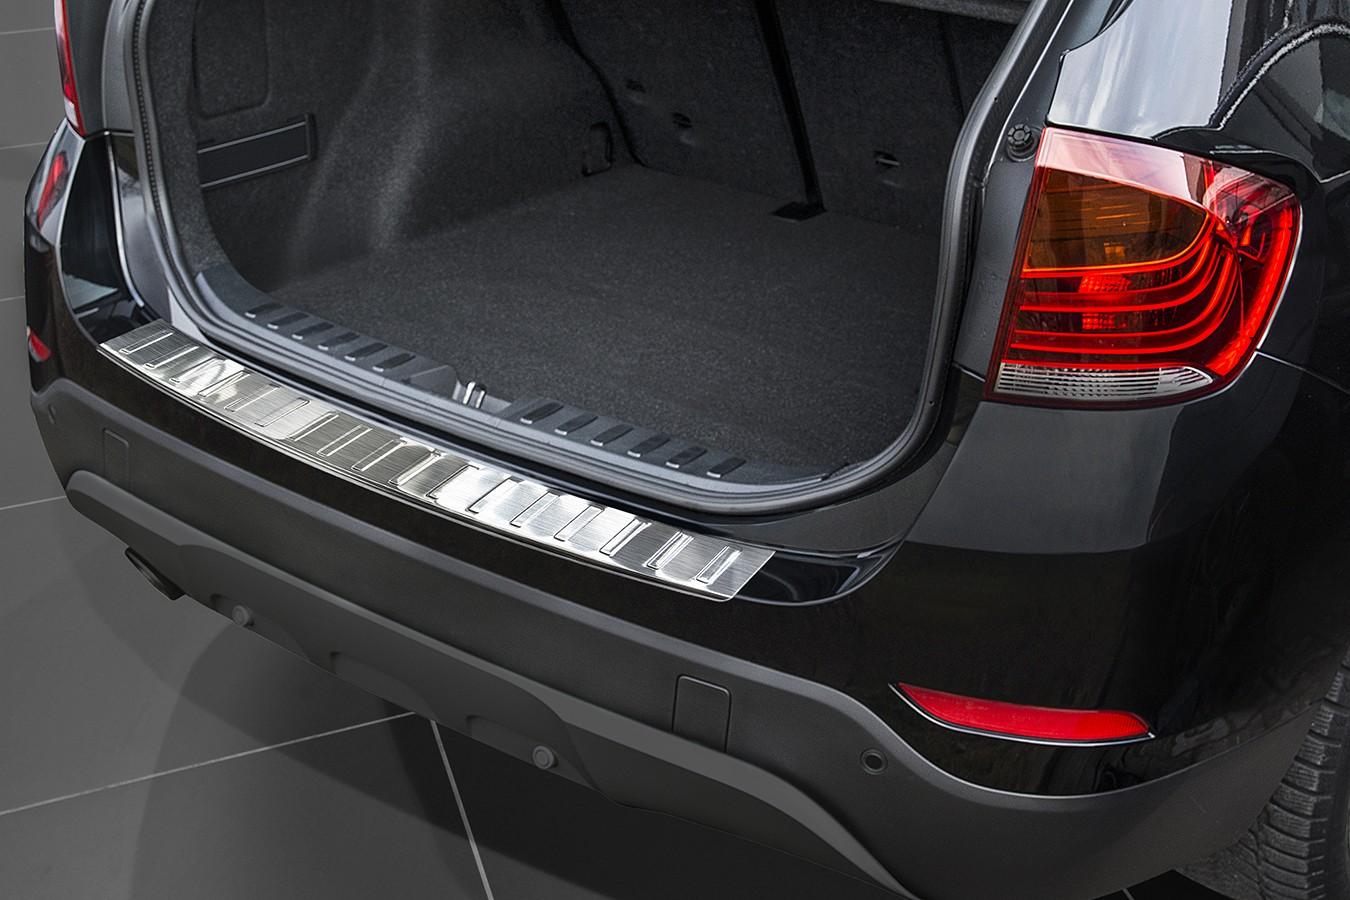 BMW X1 E84 5D profiled ribs 2012-